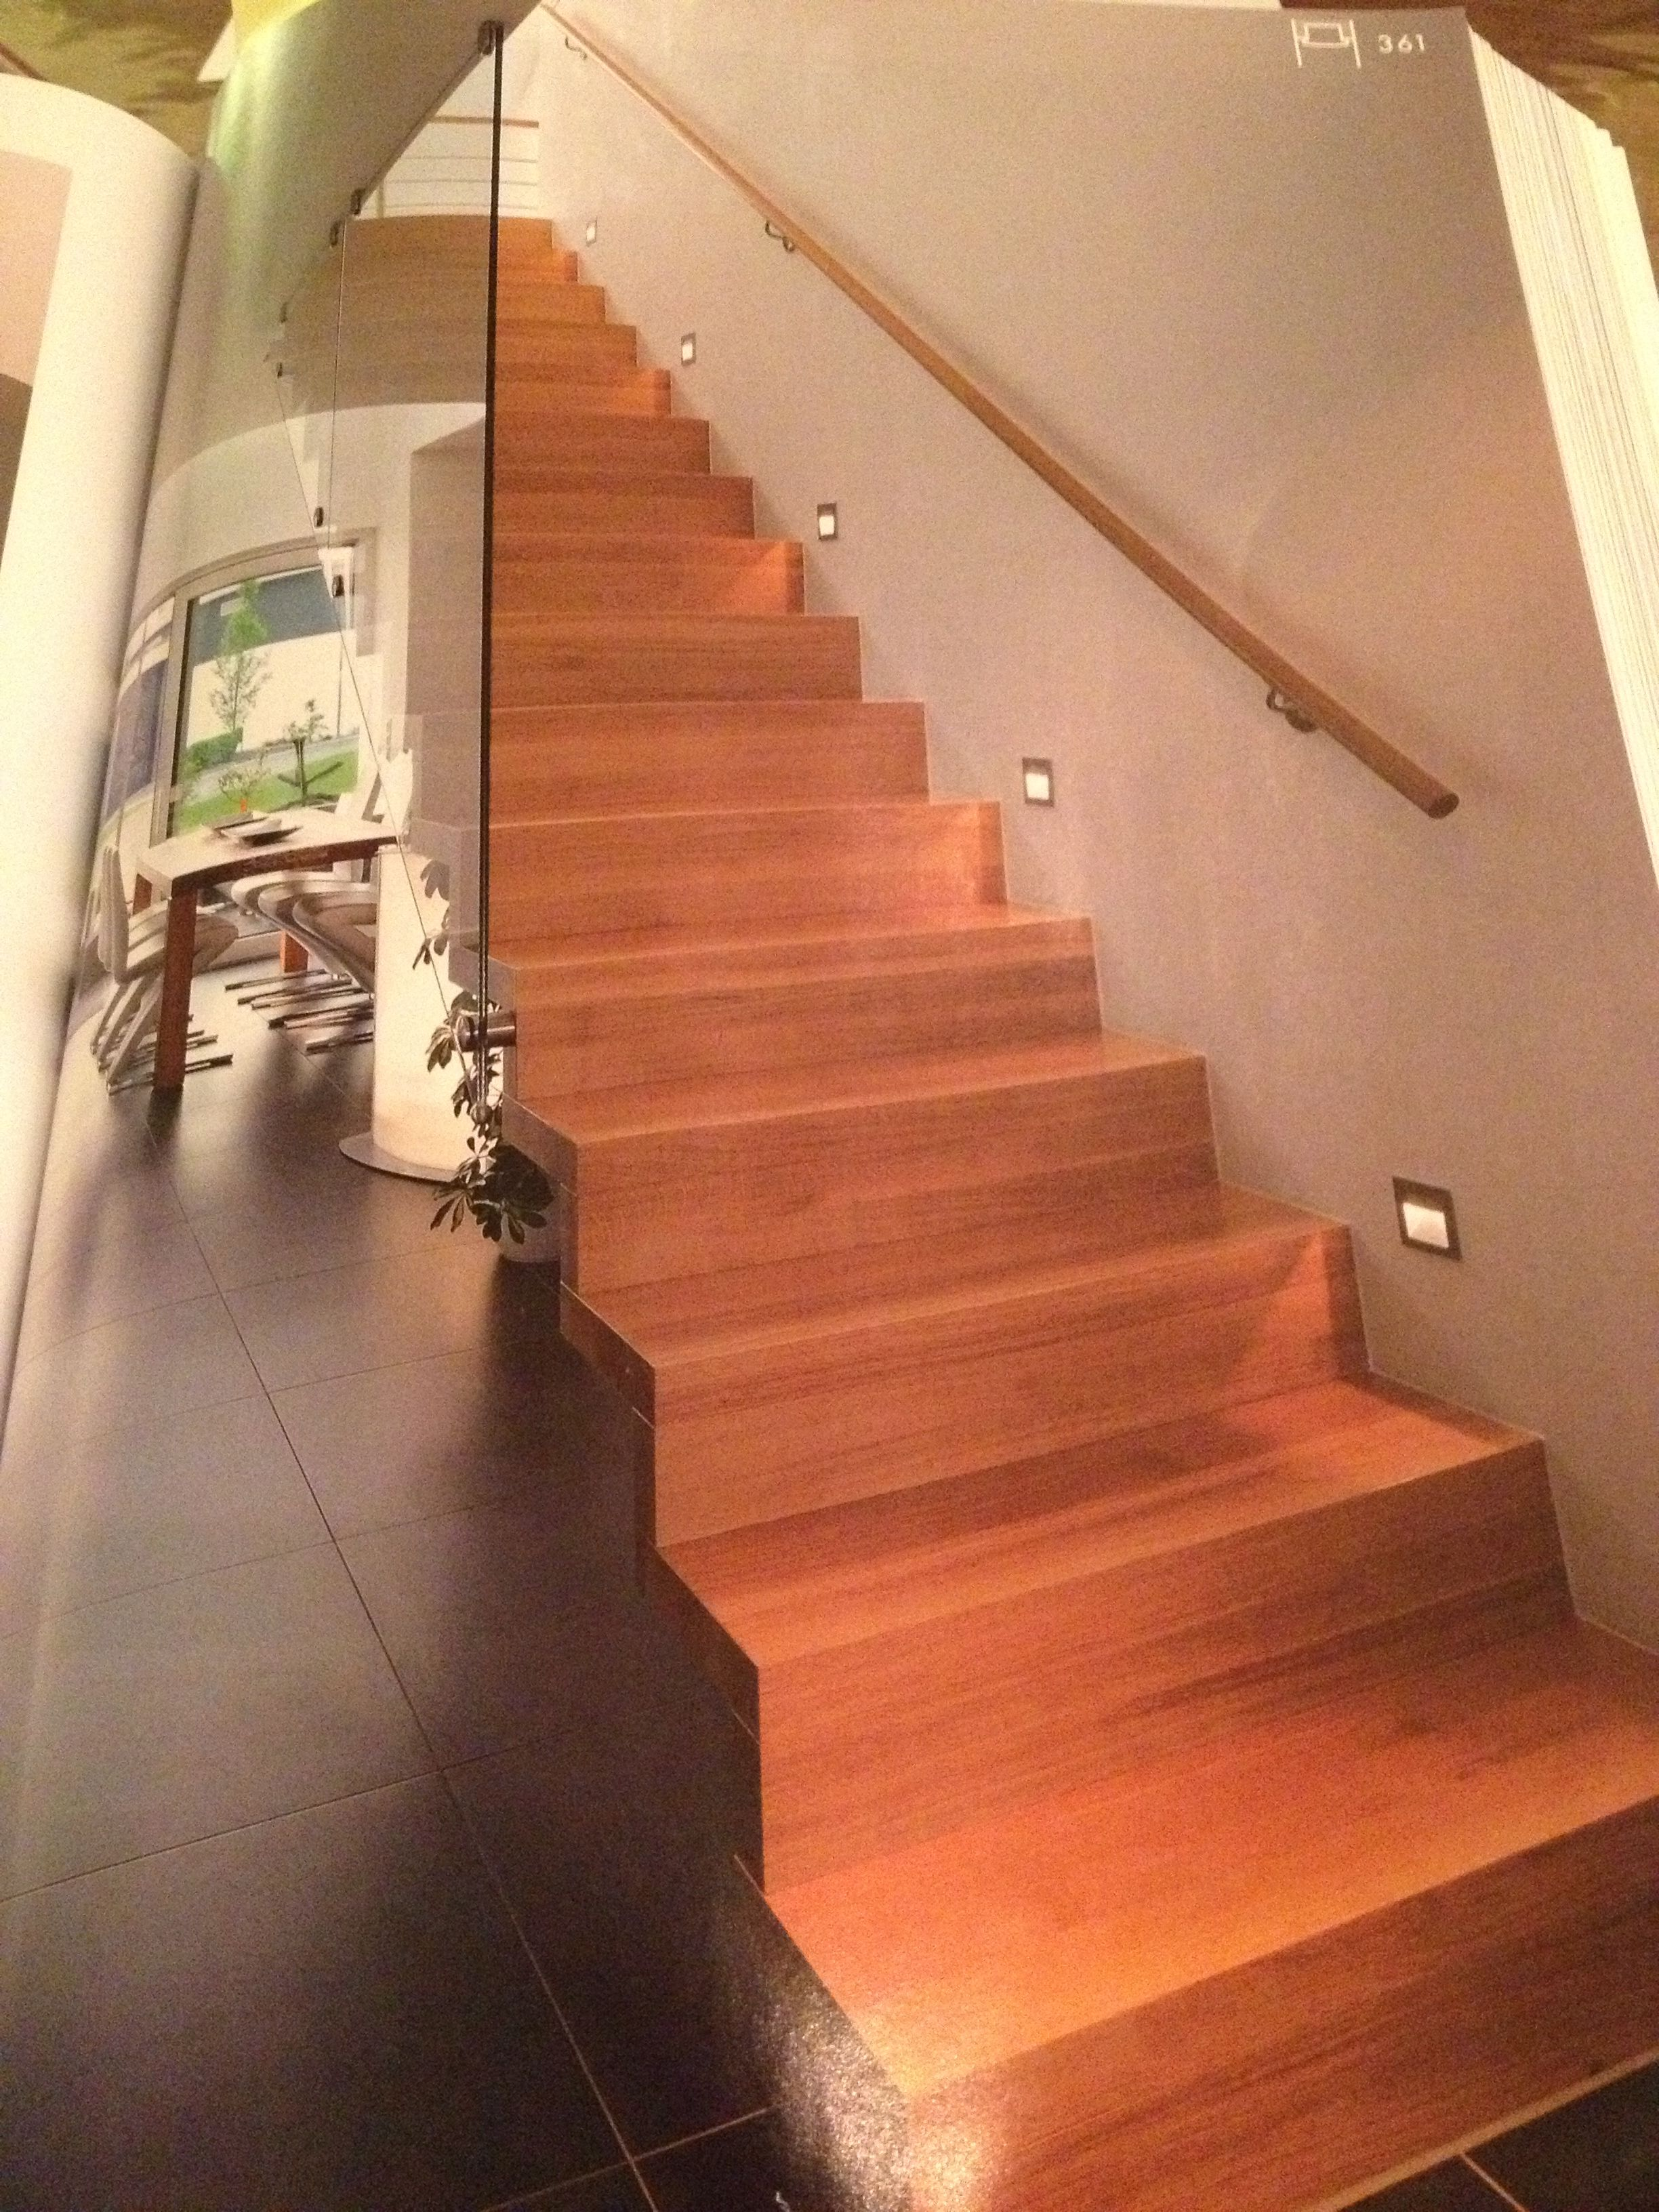 Houten trap met glazen wand trap pinterest - Wand trap ...